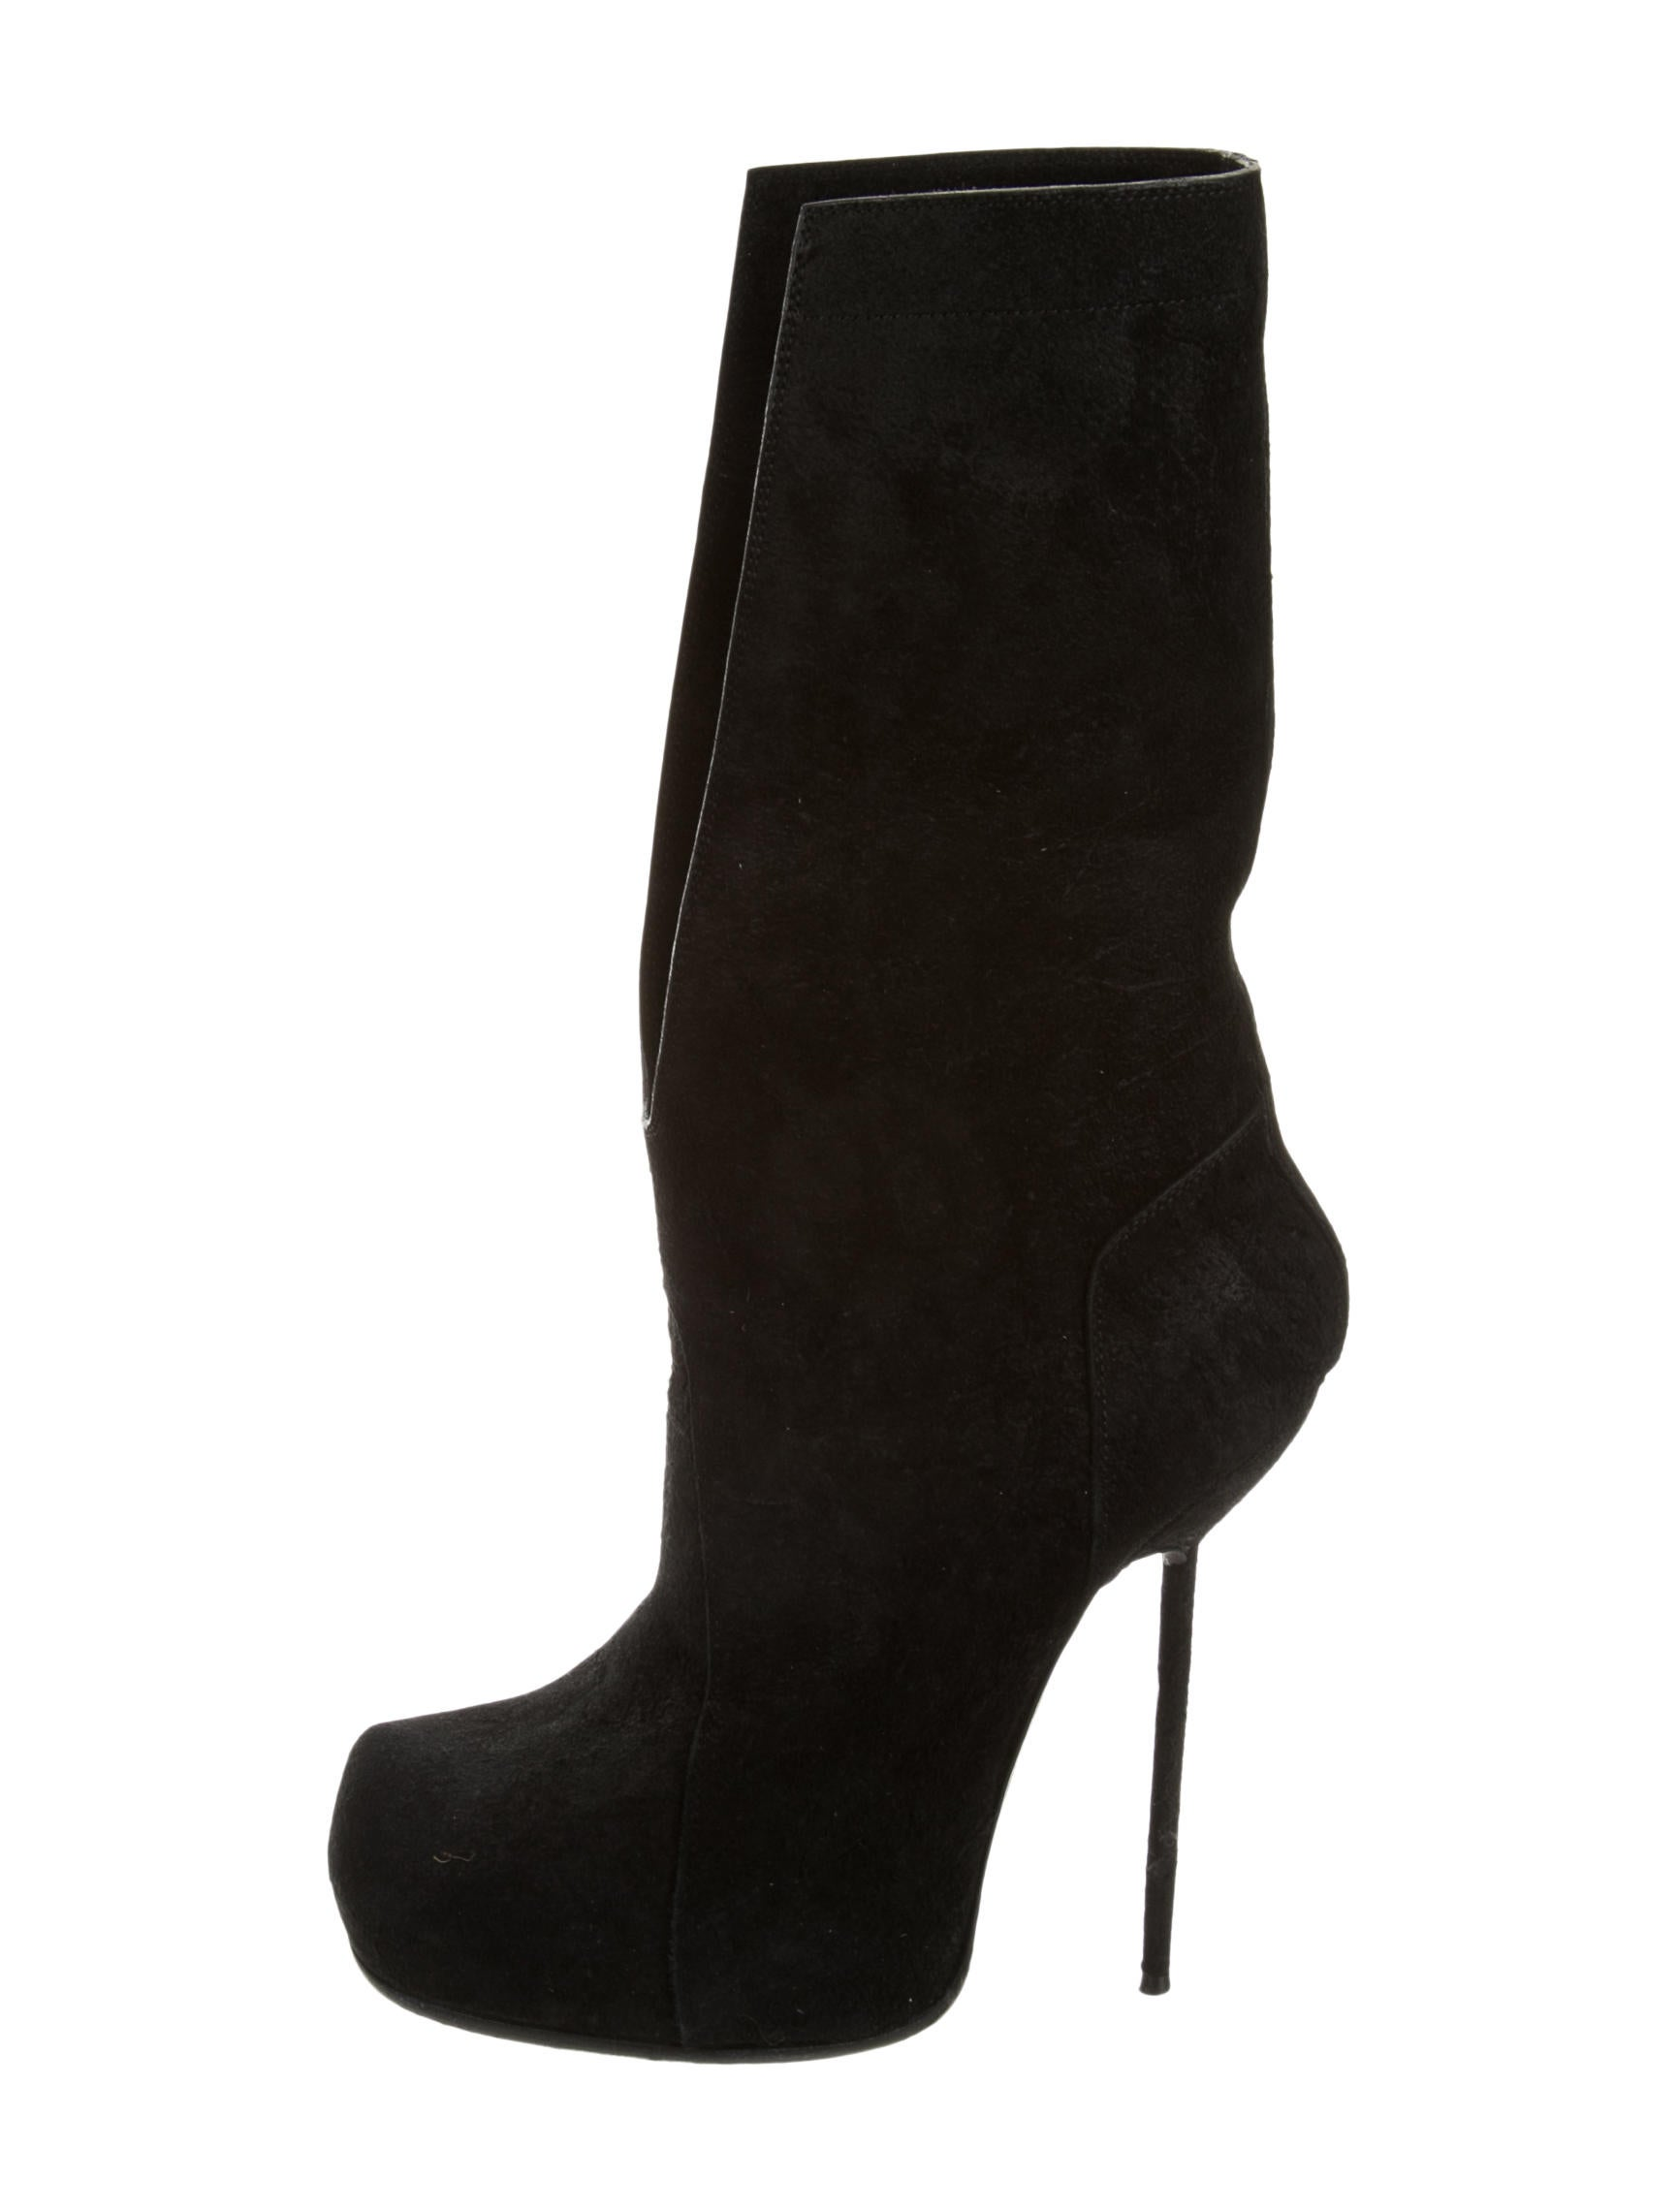 rick owens suede platform boots shoes ric25792 the